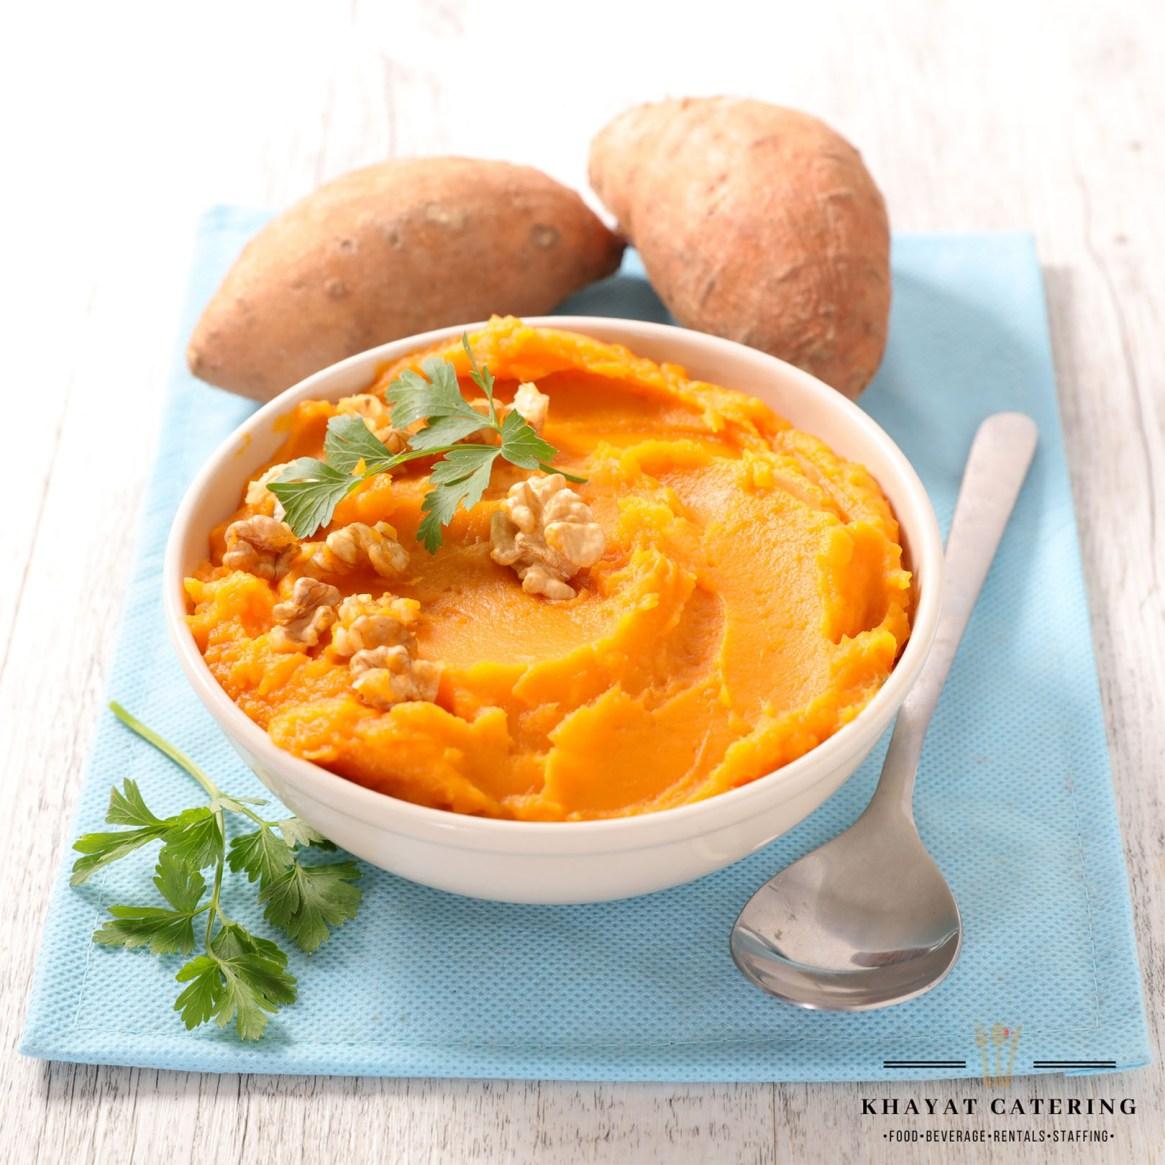 Khayat Catering mashed sweet potato